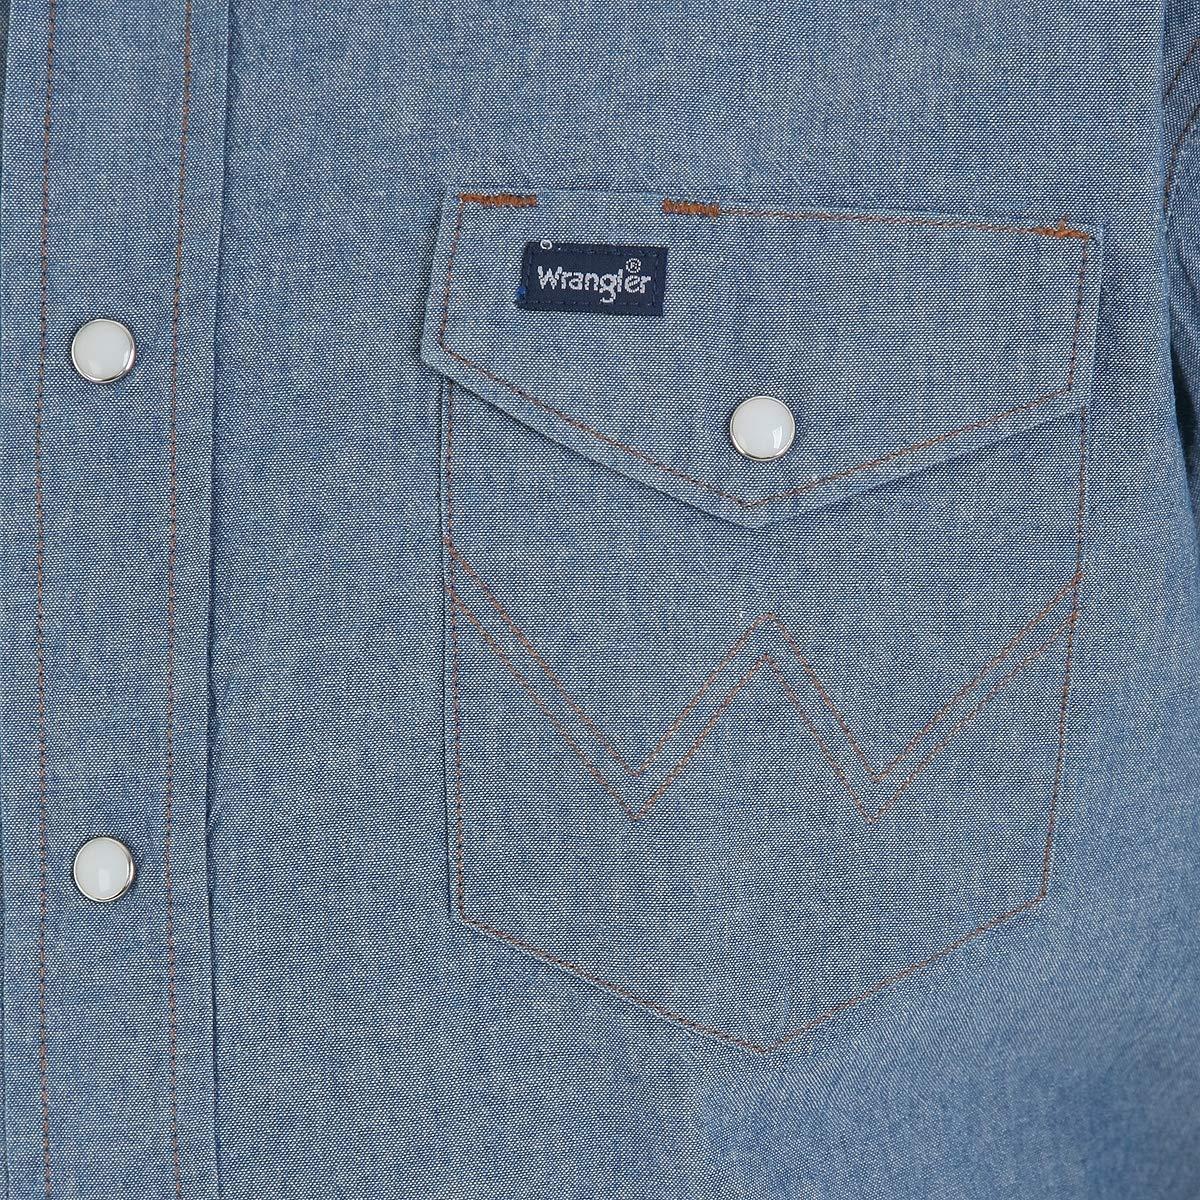 2c11382f59b Wrangler Men s Authentic Cowboy Cut Work Western Long-Sleeve Firm Finish  Shirt